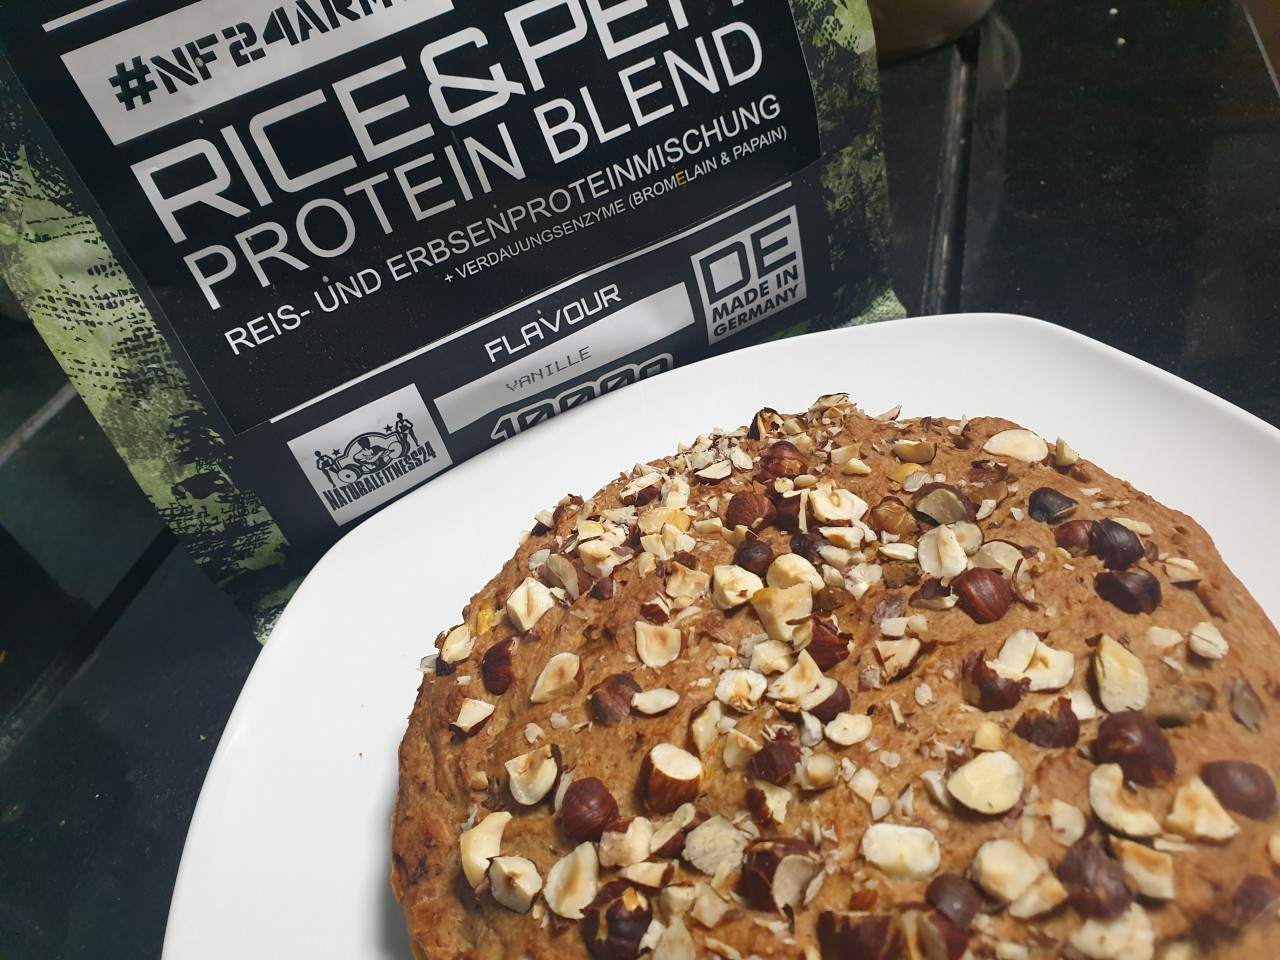 veganes proteinpulver rezept